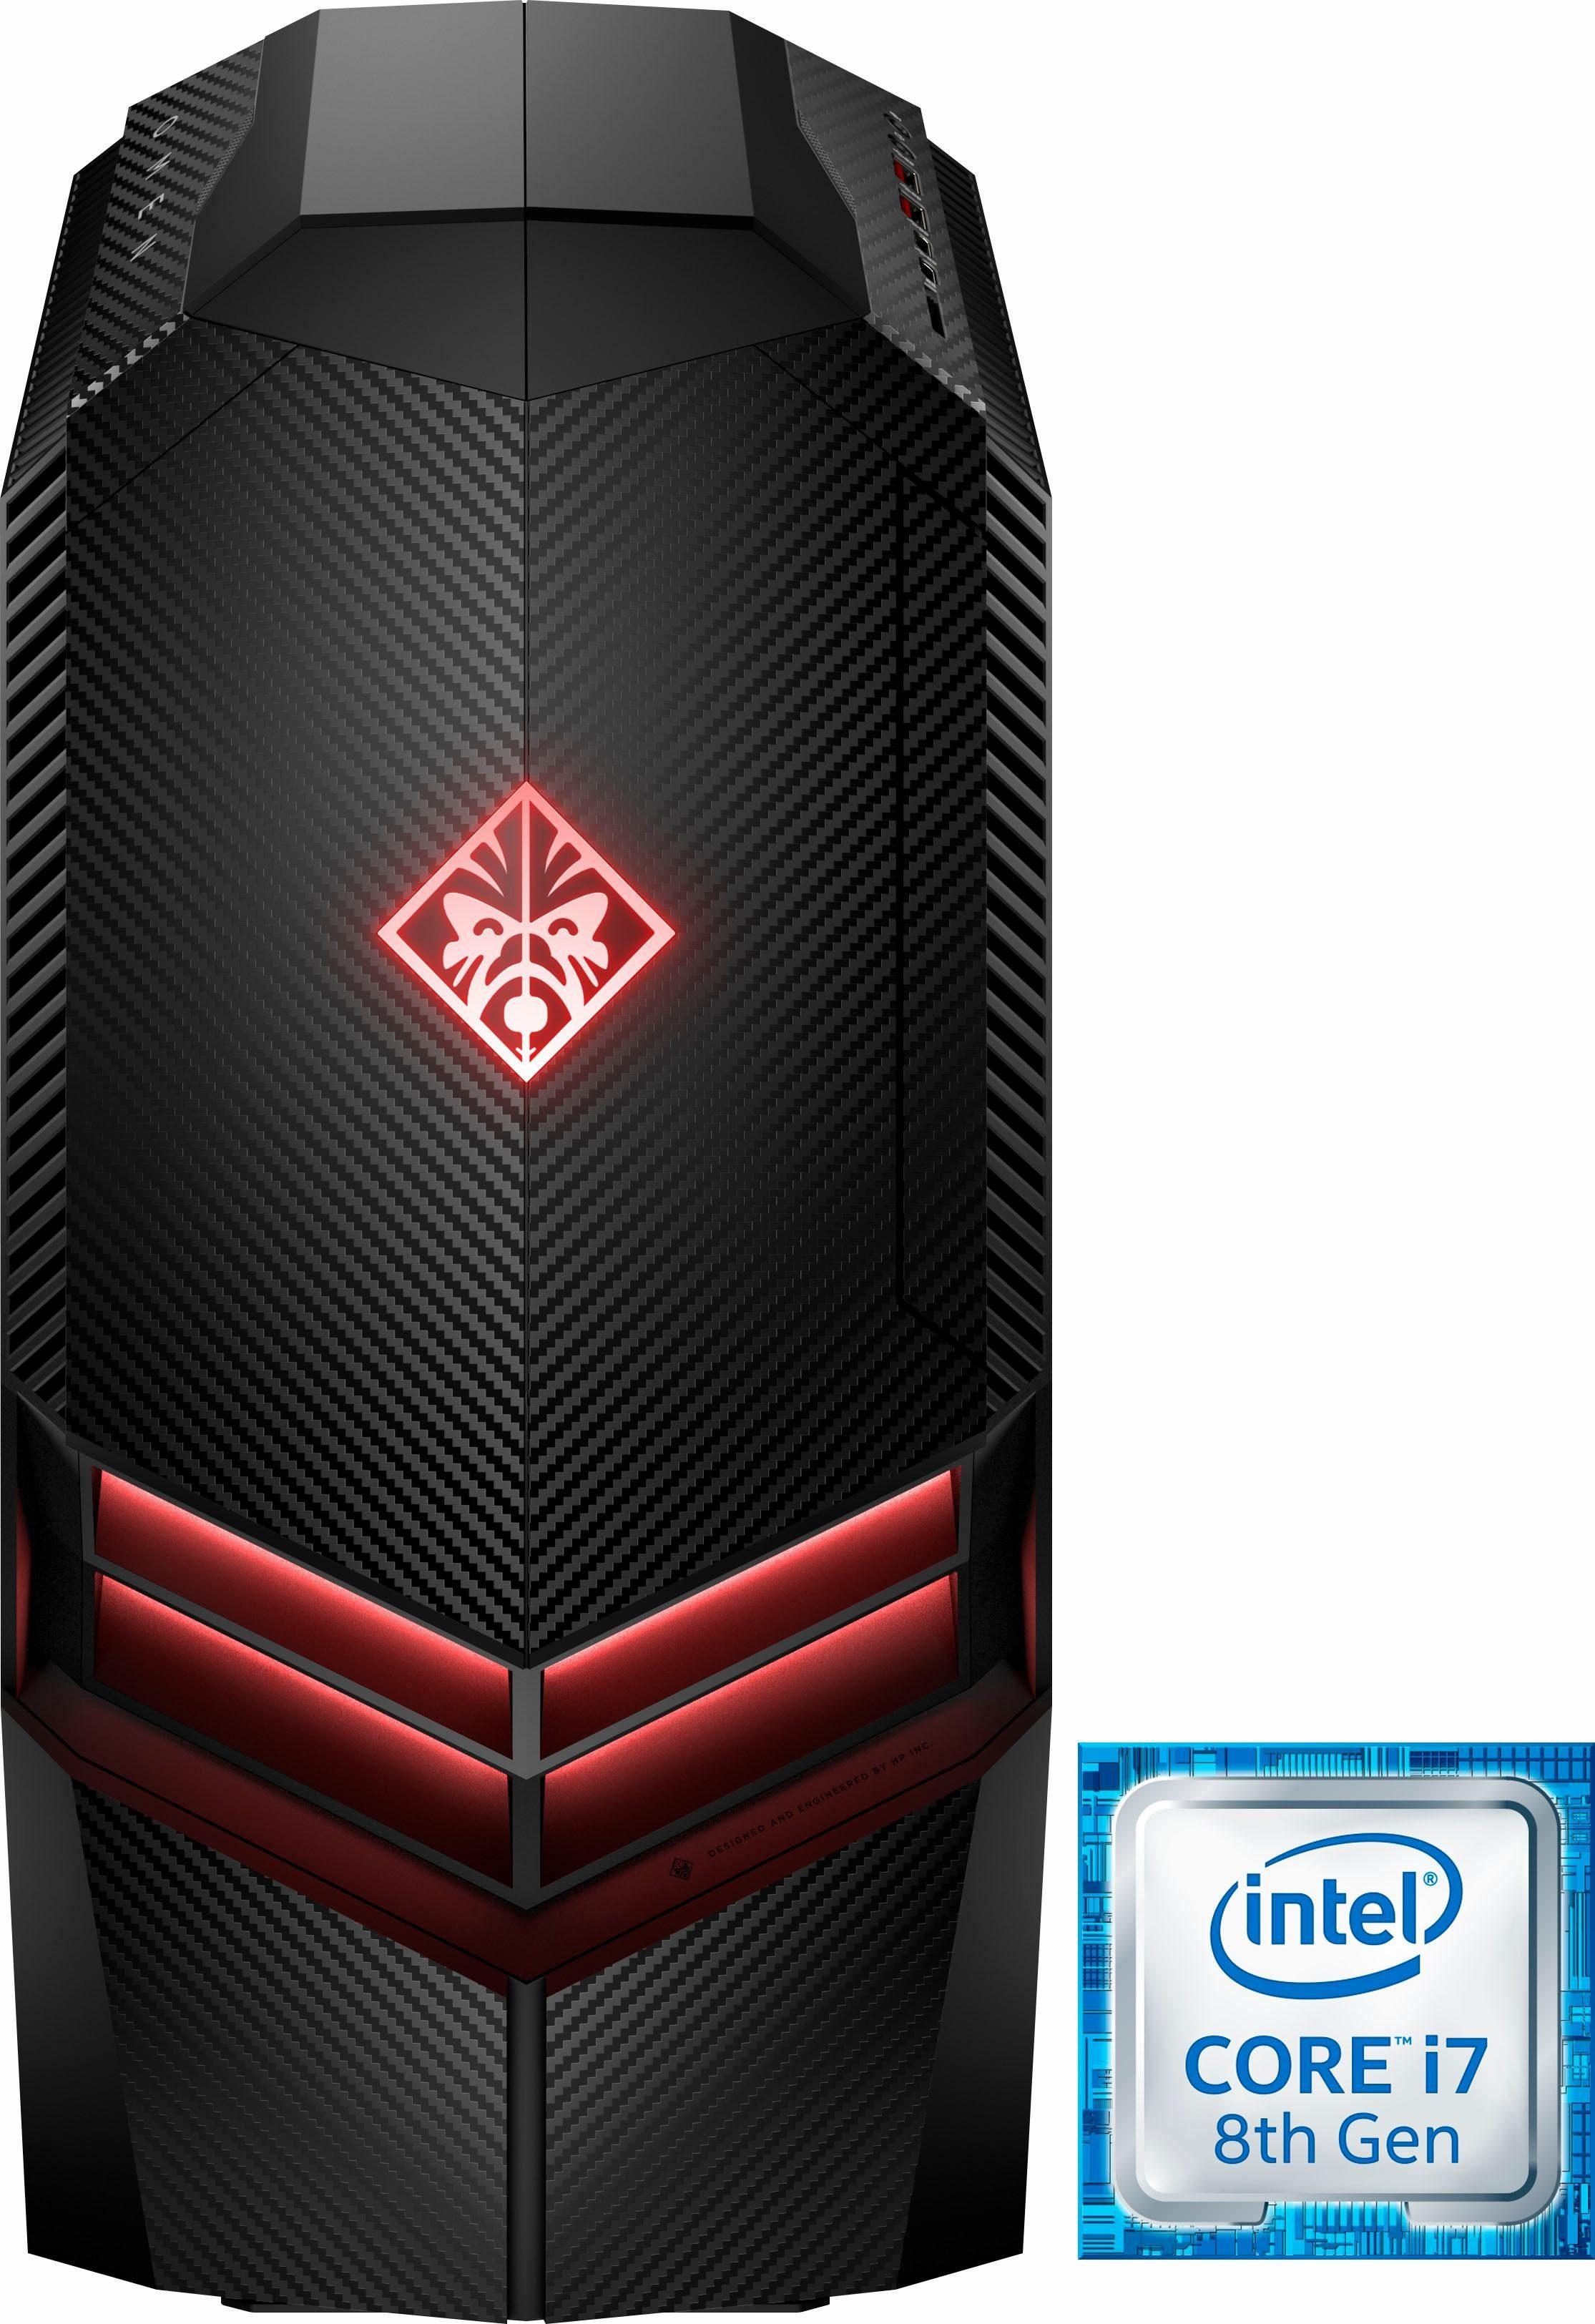 OMEN by HP 880-173ng Gaming-PC (Intel® Core i7, GeForce, 16 GB RAM, 2000 GB HDD, 256 GB SSD)